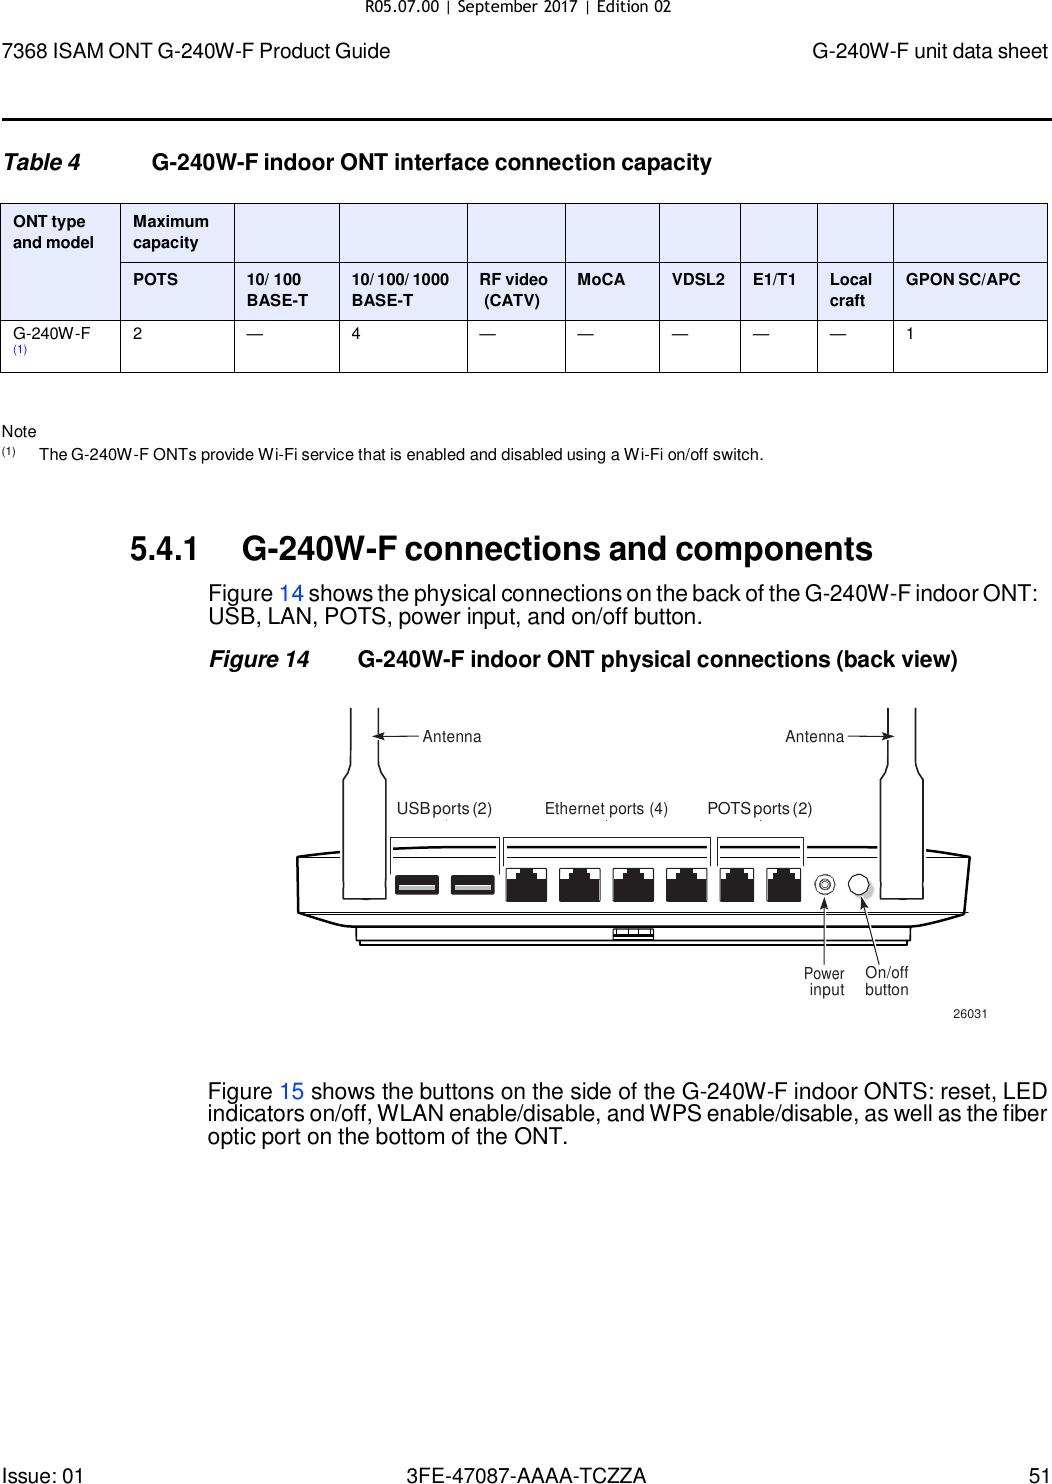 Alcatel Lucent Bell G240WFV2 7368 ISAM GPON ONU User Manual